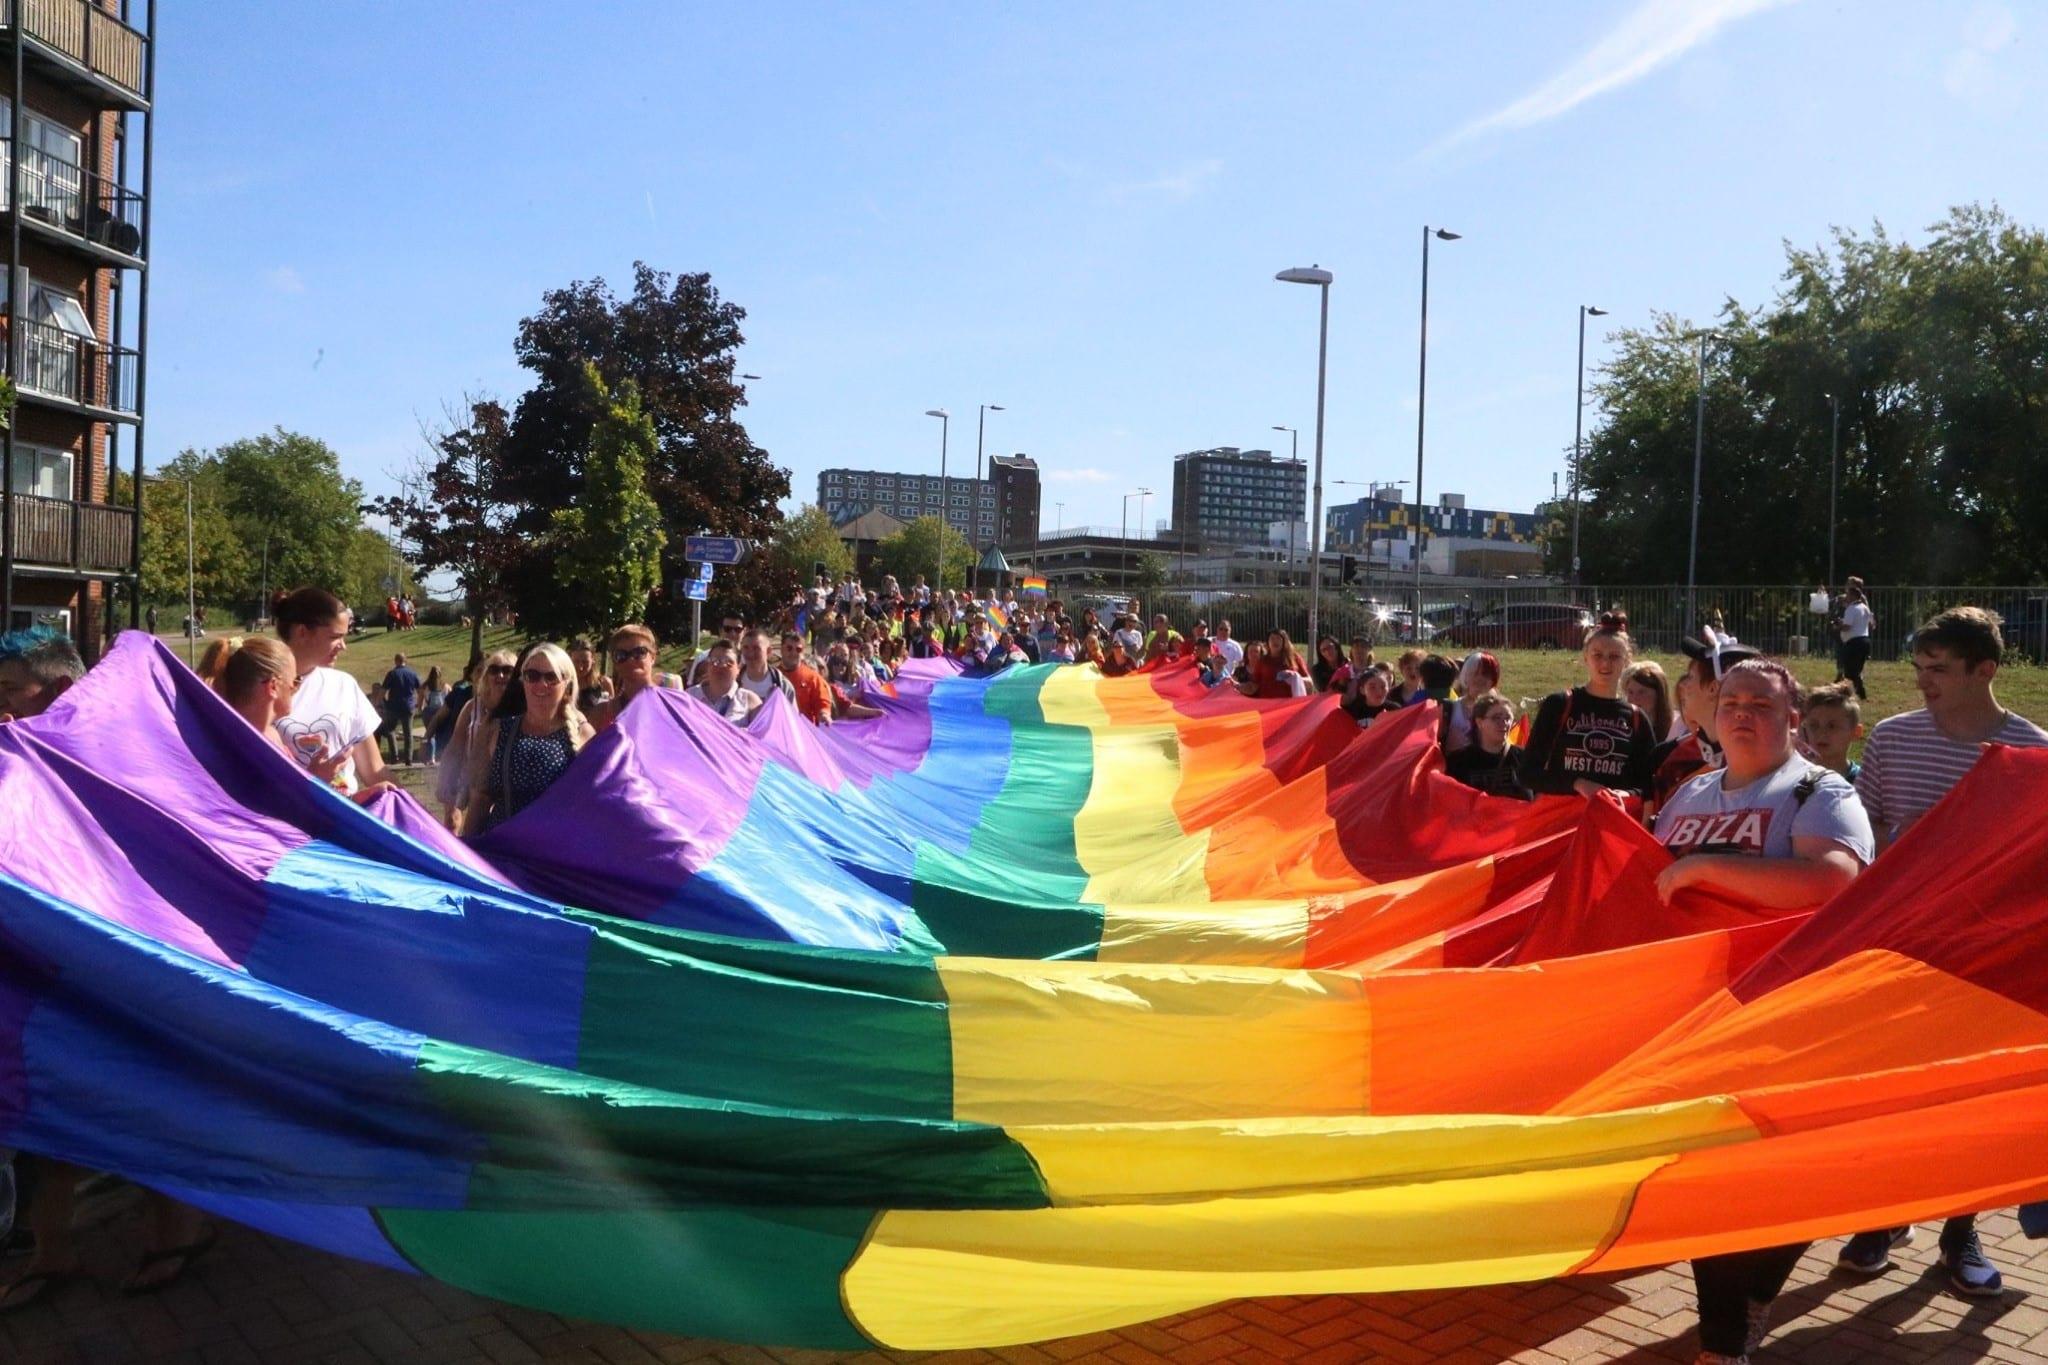 Basildon Pride %count